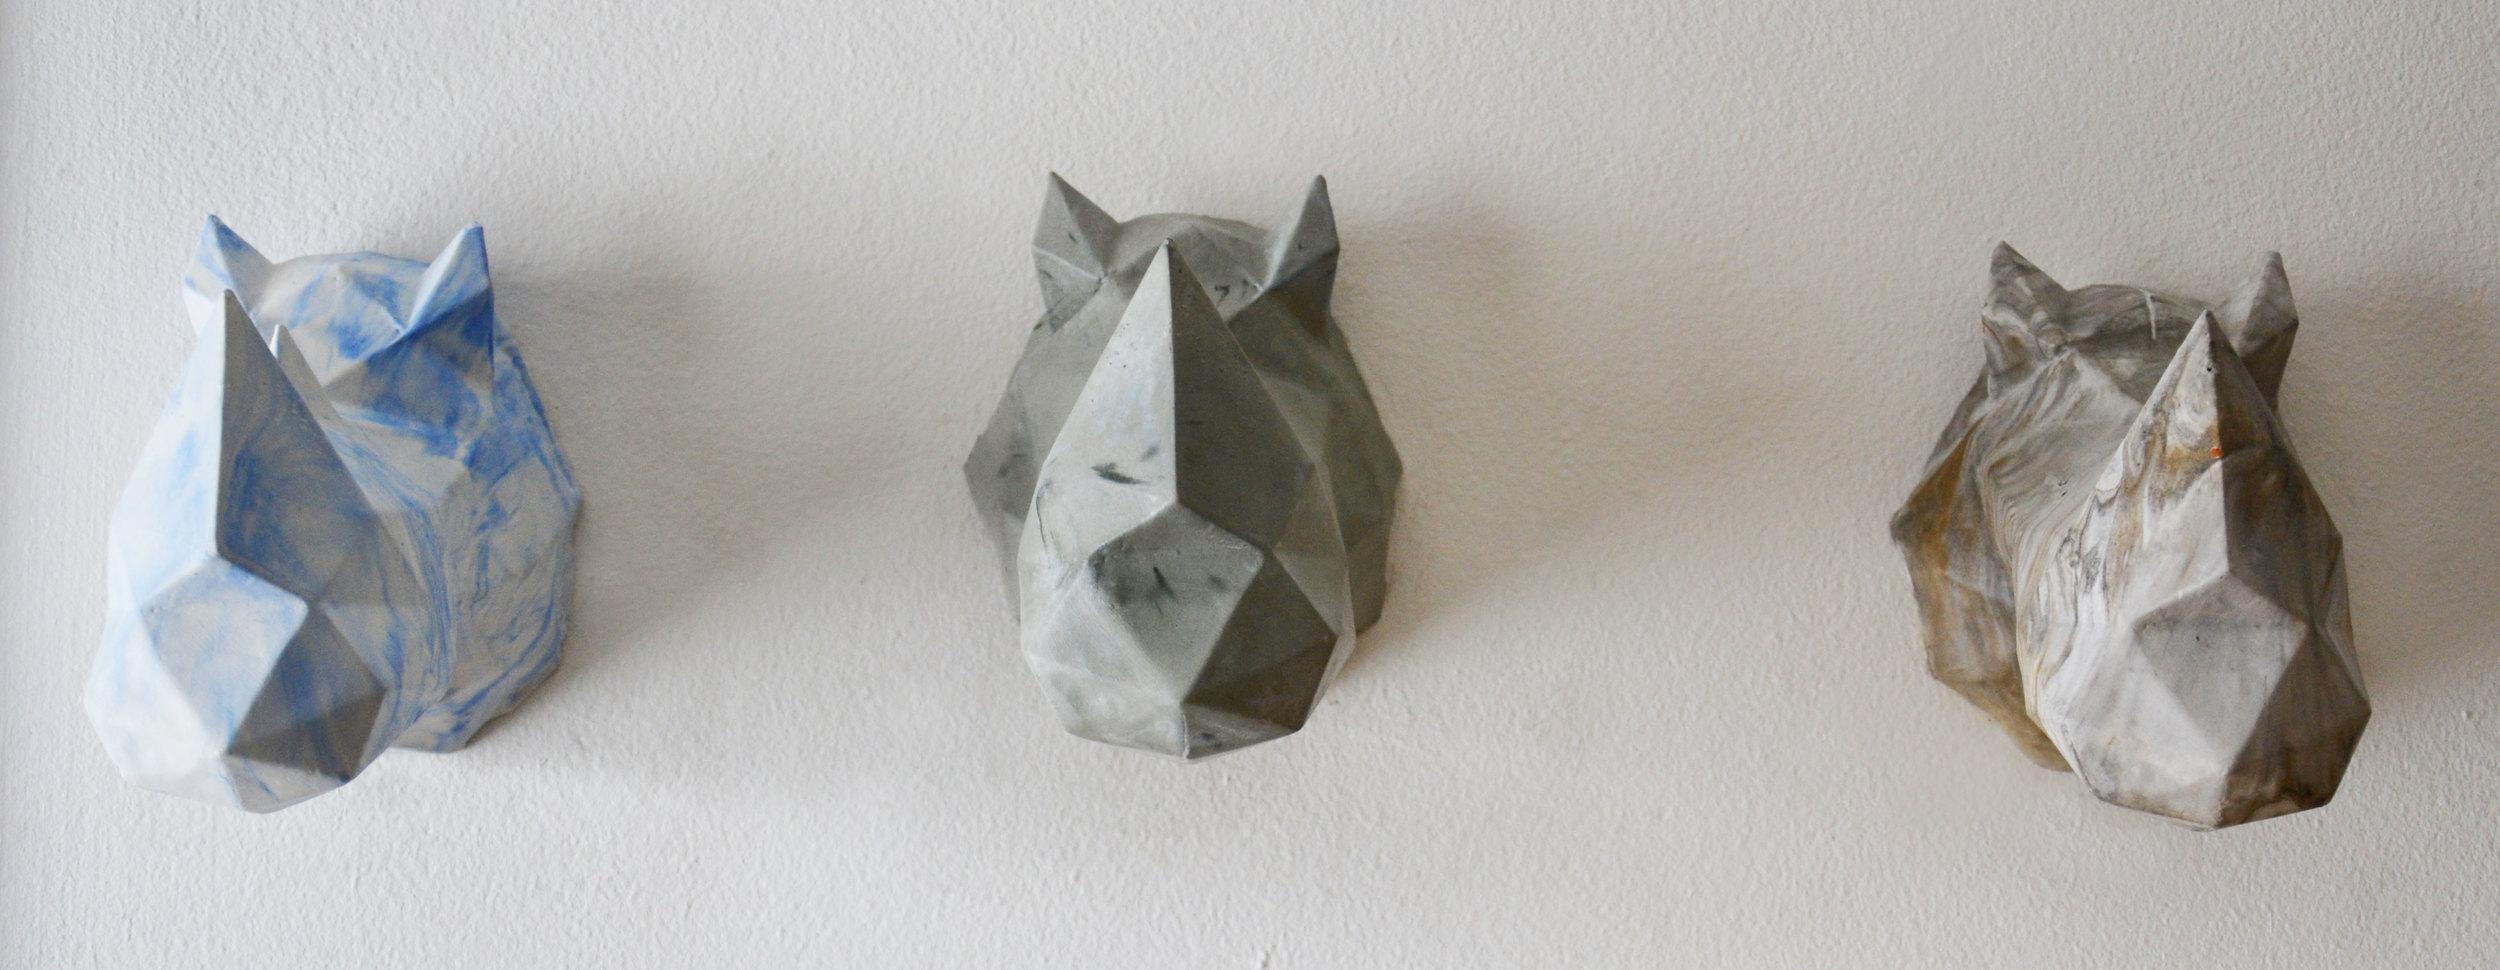 Thomas_pagliuca_misscloudy_Rhinocéros_béton_marbre